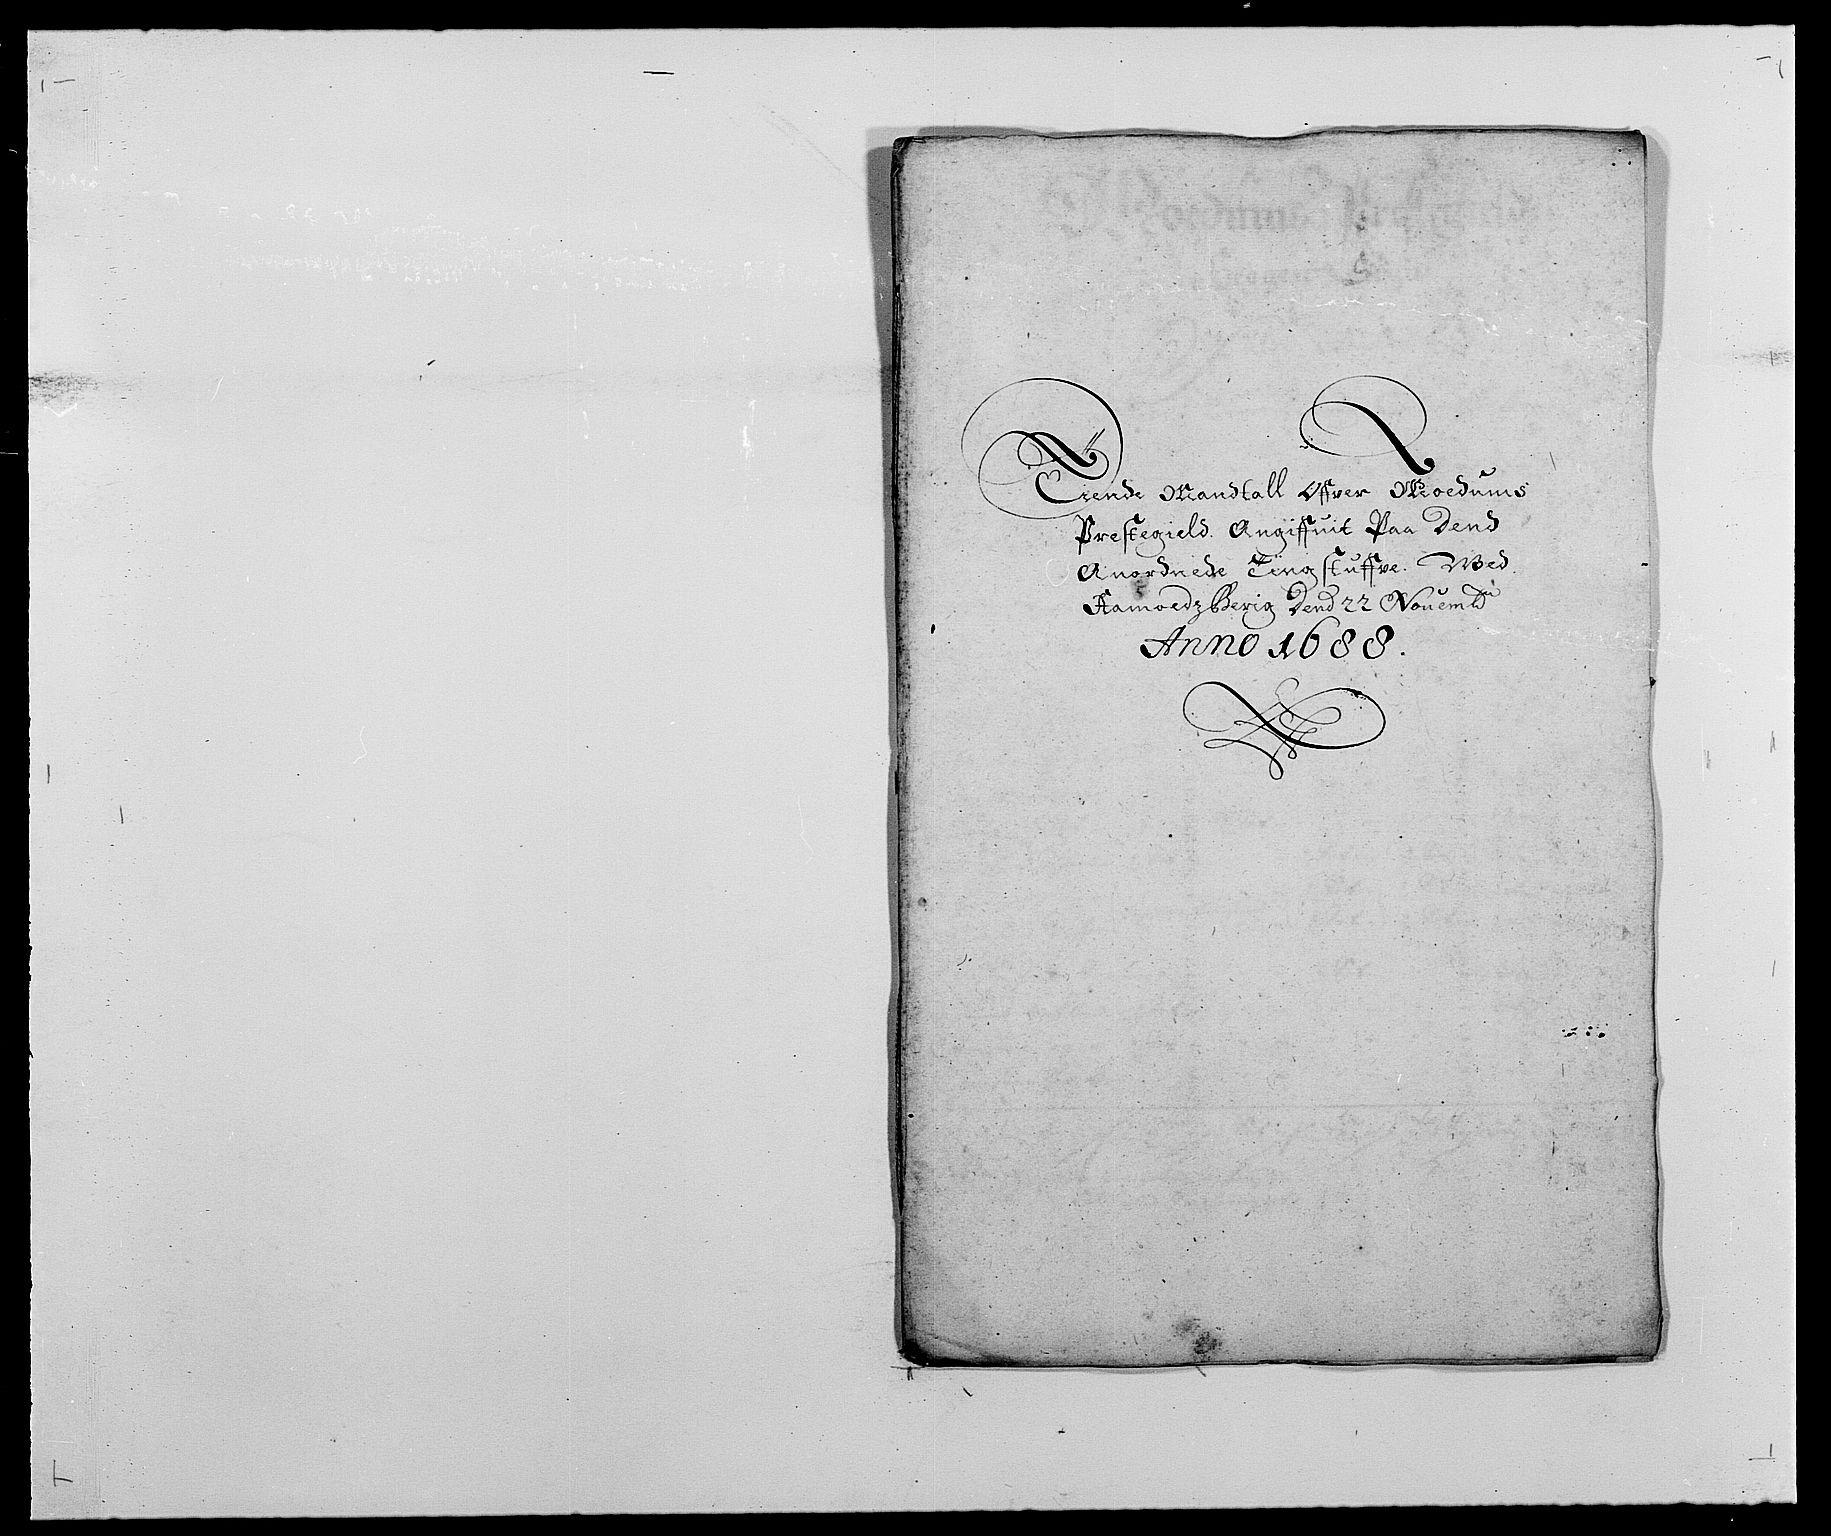 RA, Rentekammeret inntil 1814, Reviderte regnskaper, Fogderegnskap, R25/L1679: Fogderegnskap Buskerud, 1687-1688, s. 264